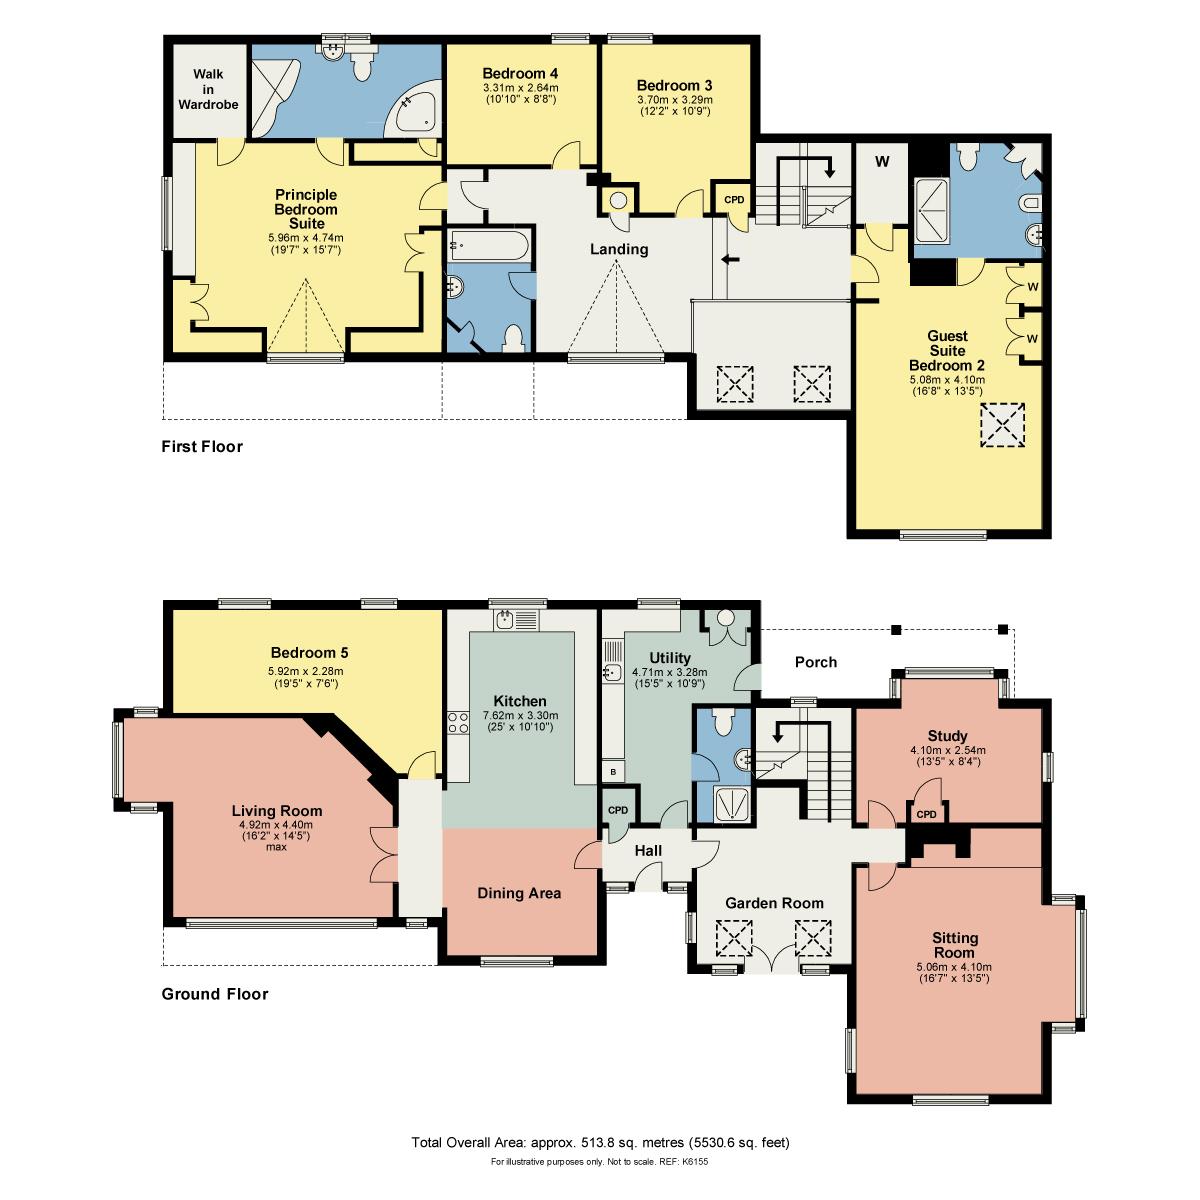 Floorplan The Oaks, Crook Road, Kendal, Cumbria LA8 8LX